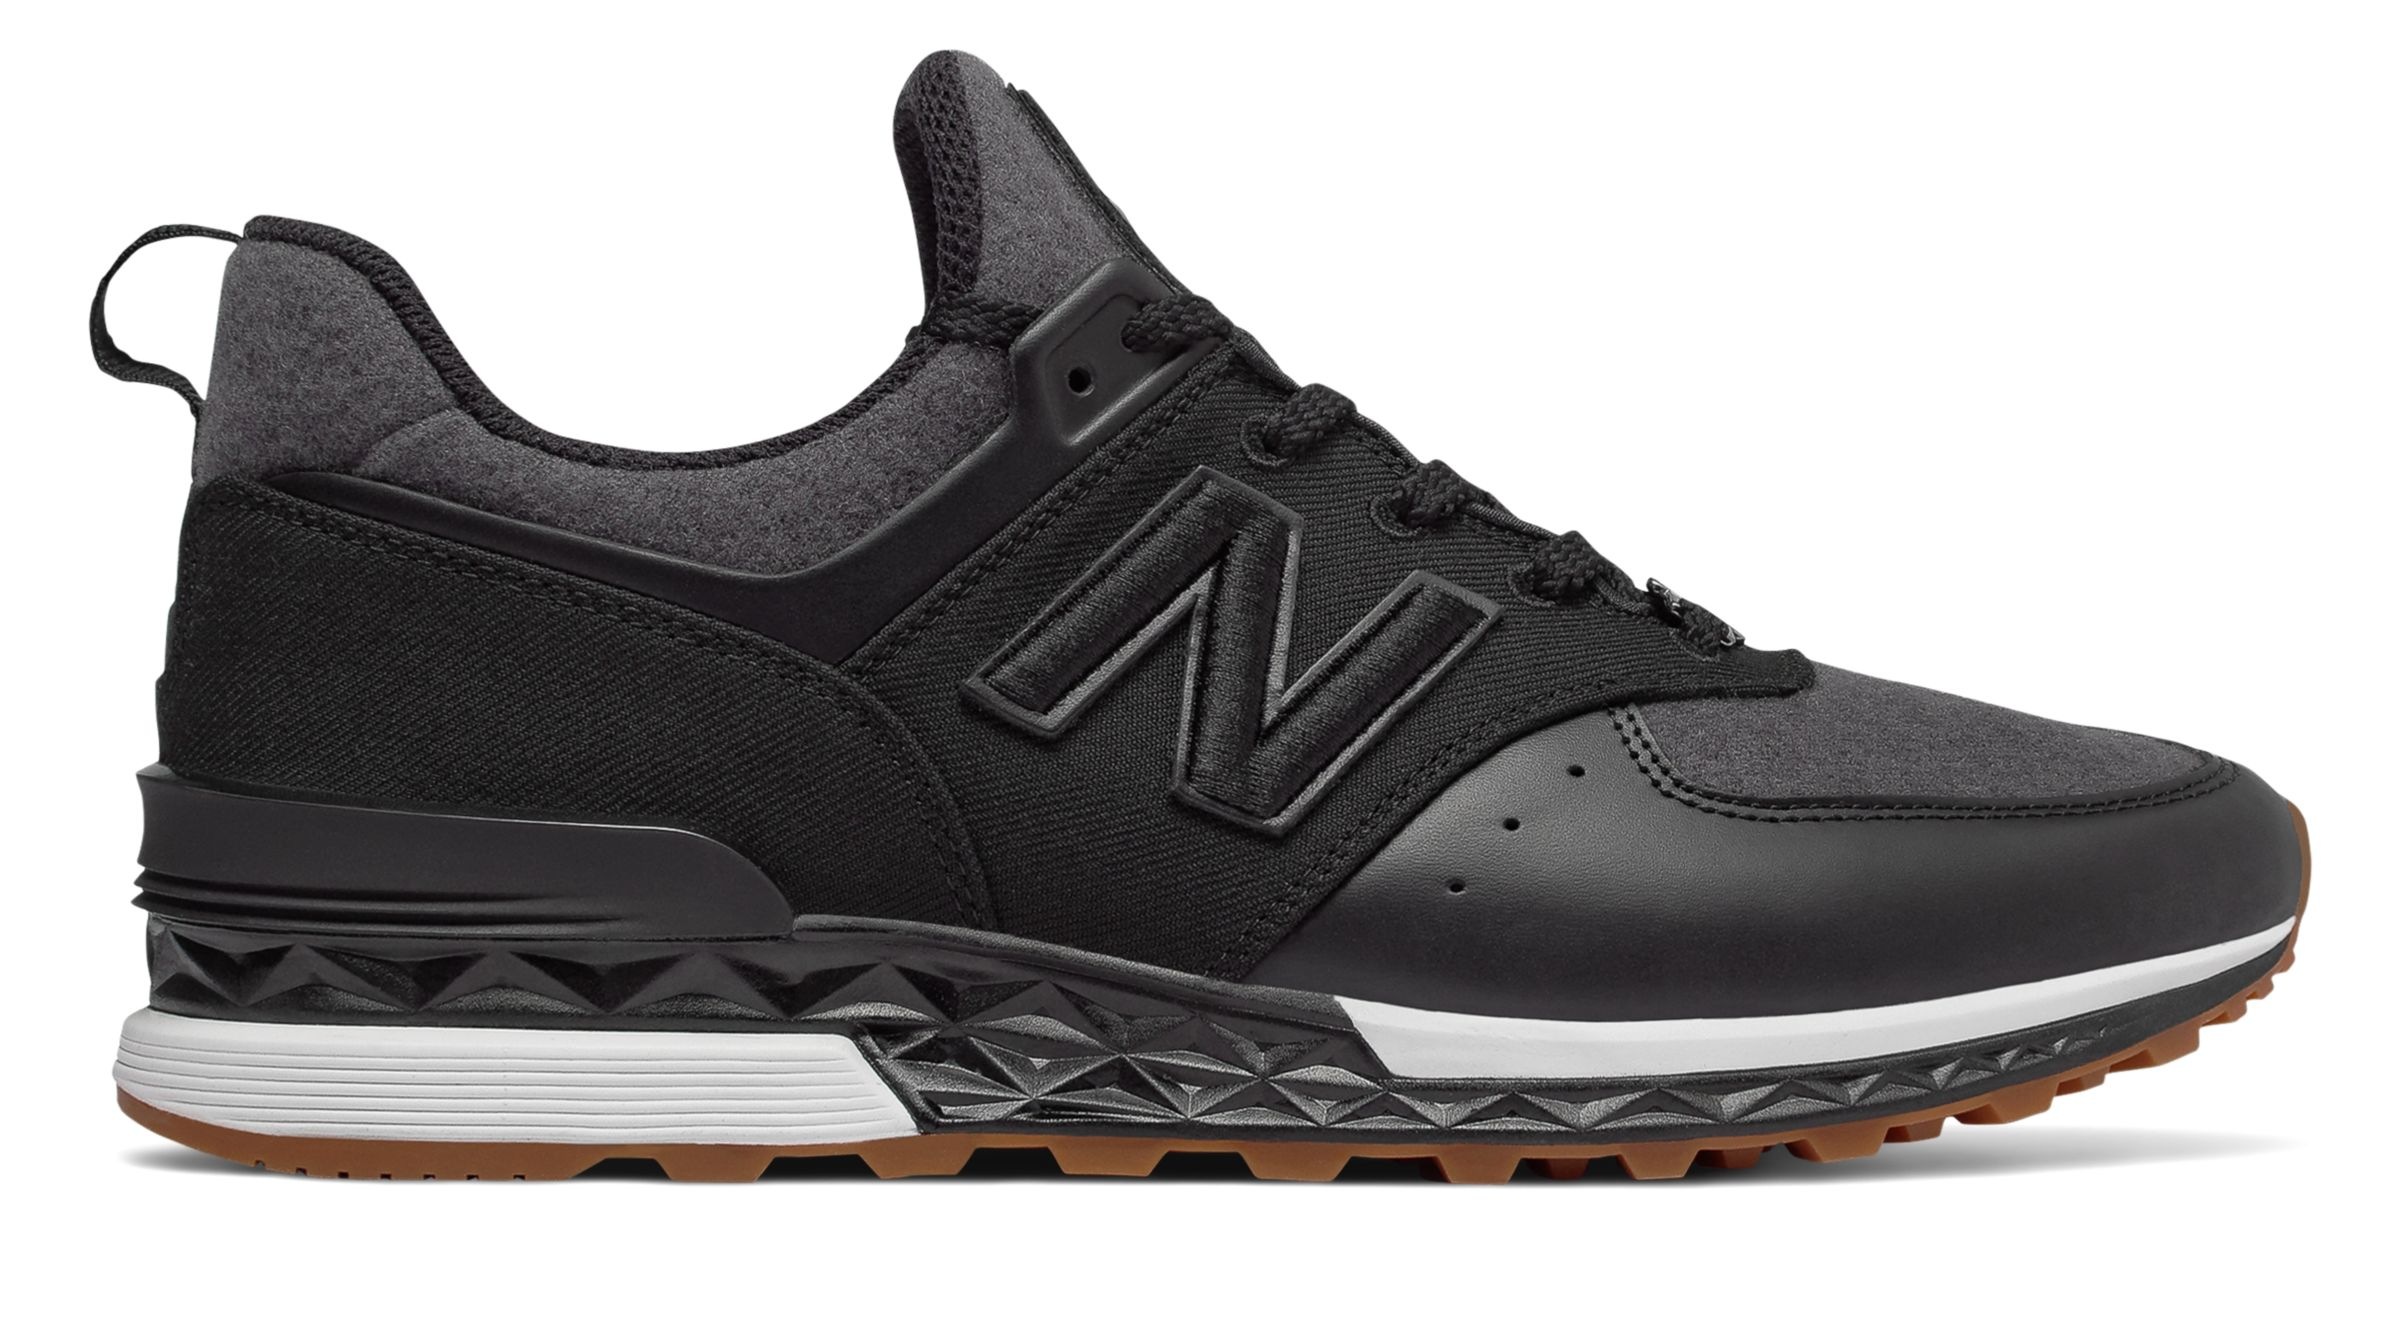 ff2992558d9f9 New Balance Men s 574 Sport NB x New Era Shoes Black